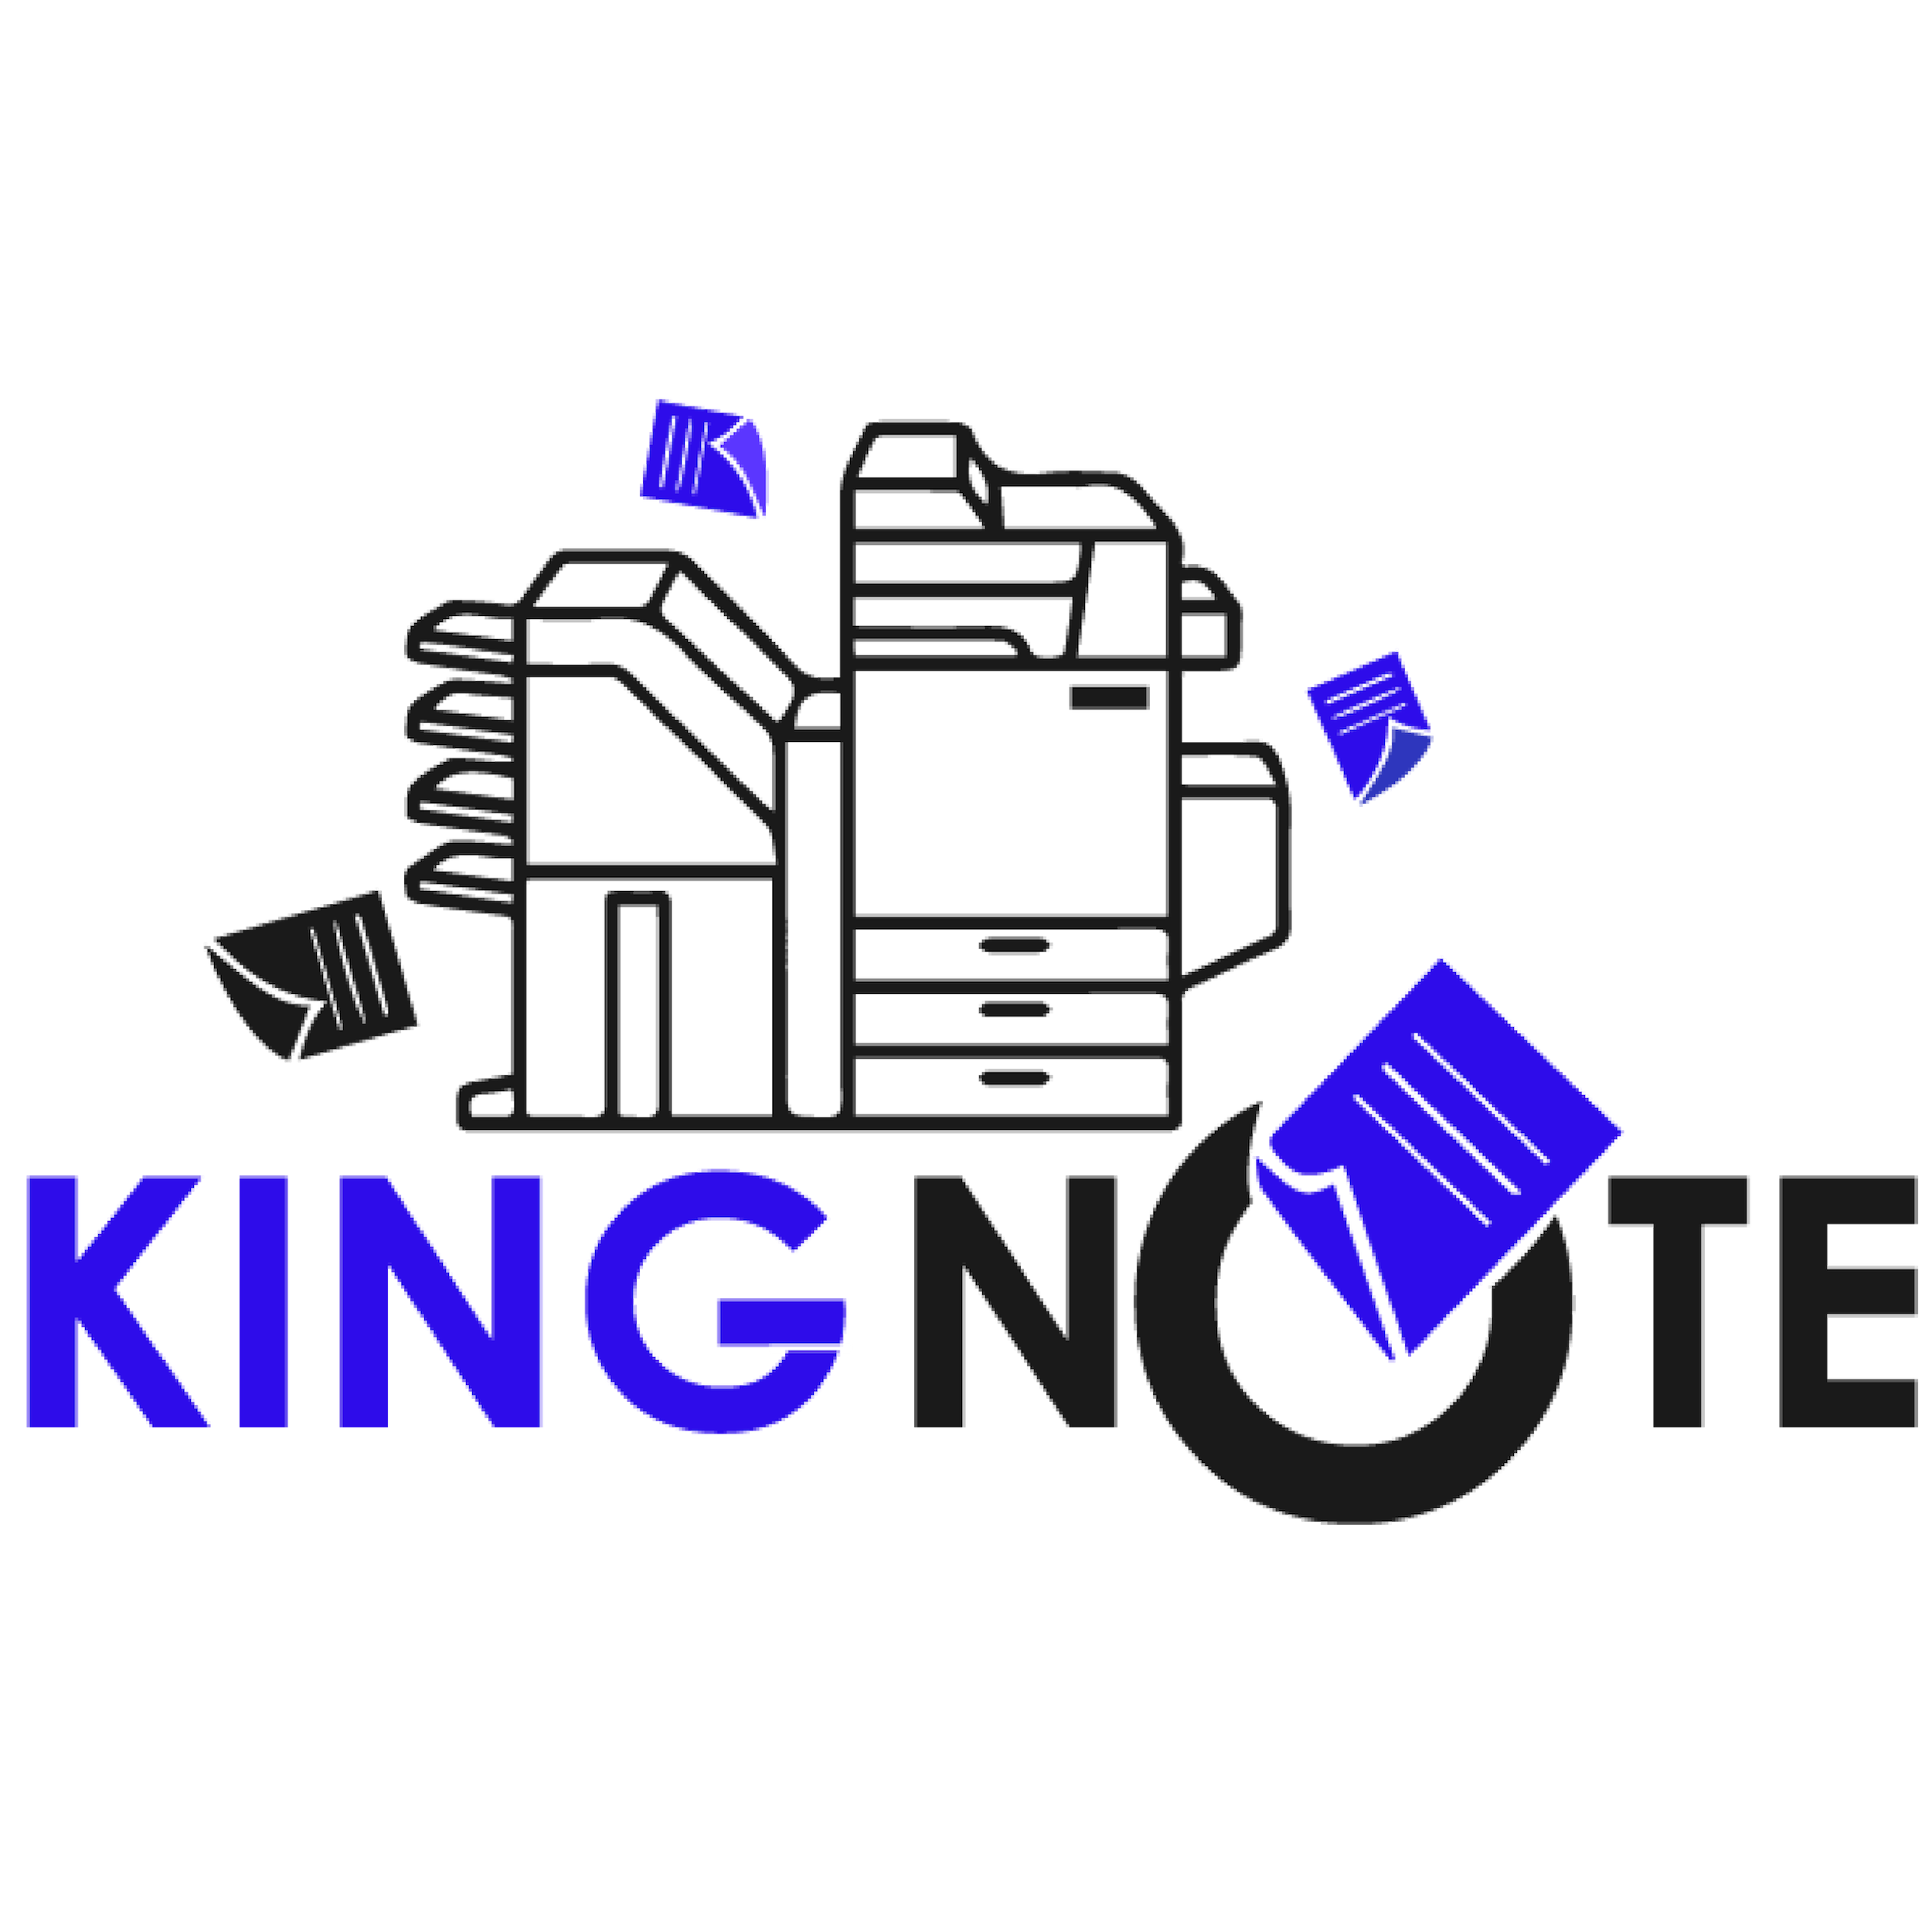 Kingnote Copier Logo 2500.png